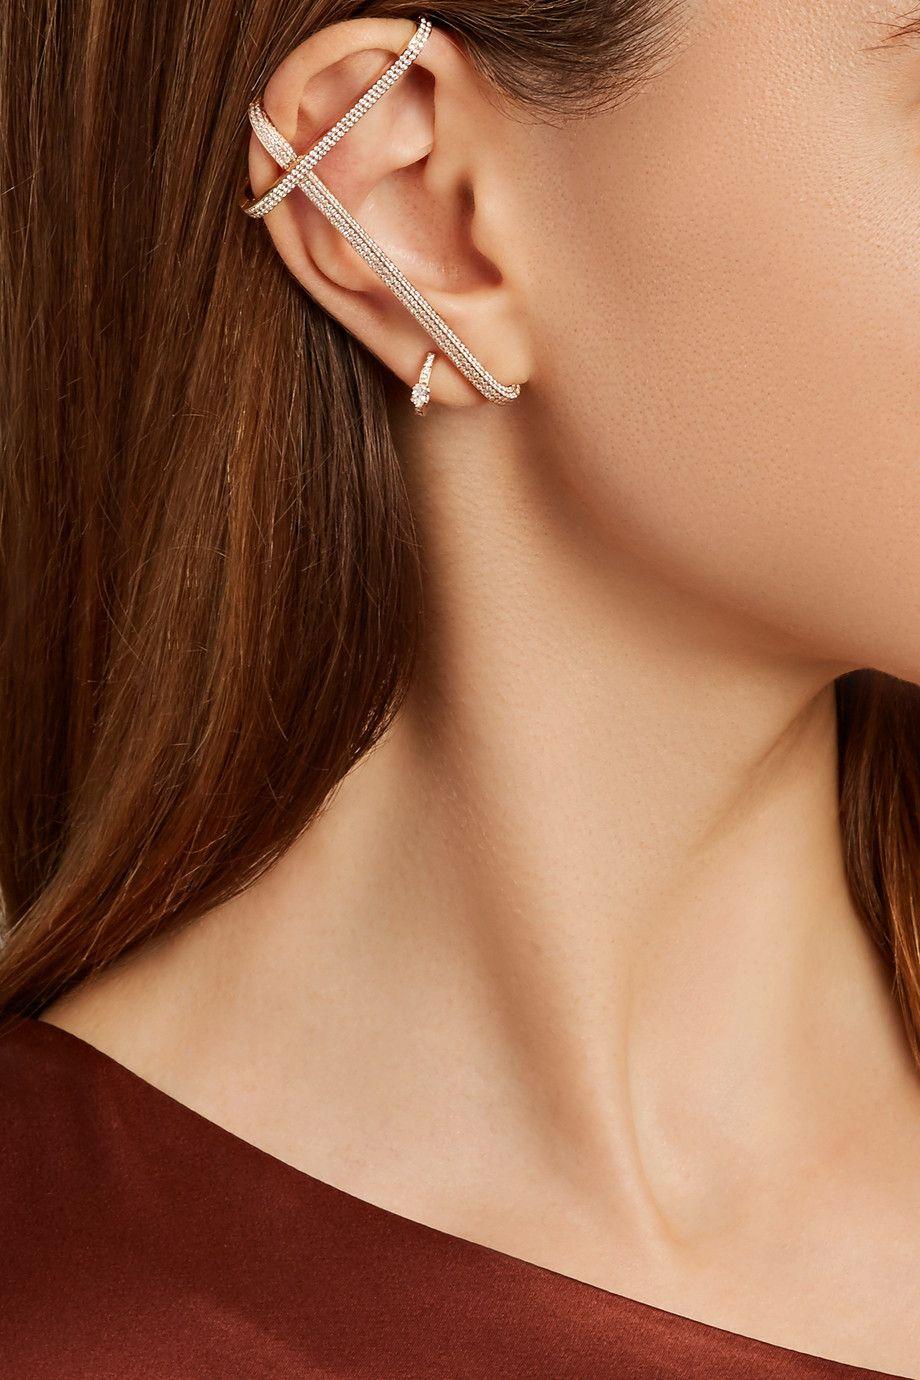 Repossi Staple 18-karat Rose Gold Ear Cuff 02NrW